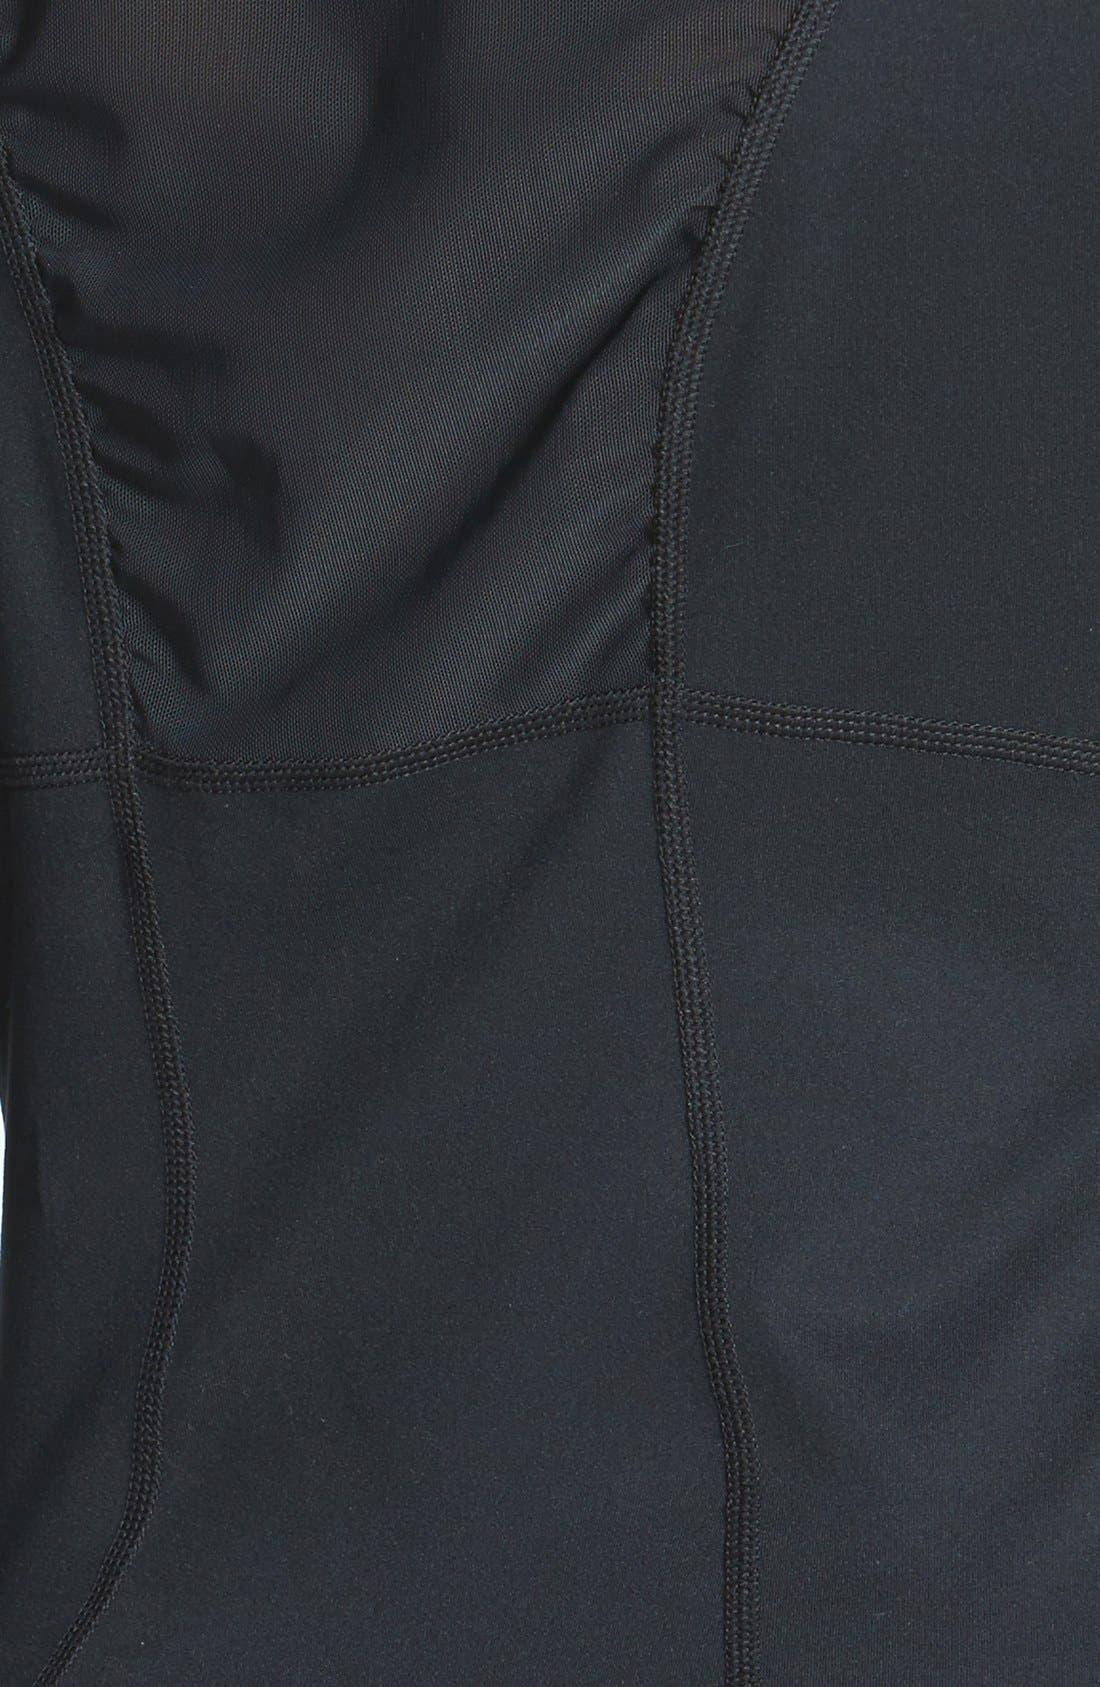 'Essential' Jacket,                             Alternate thumbnail 3, color,                             001